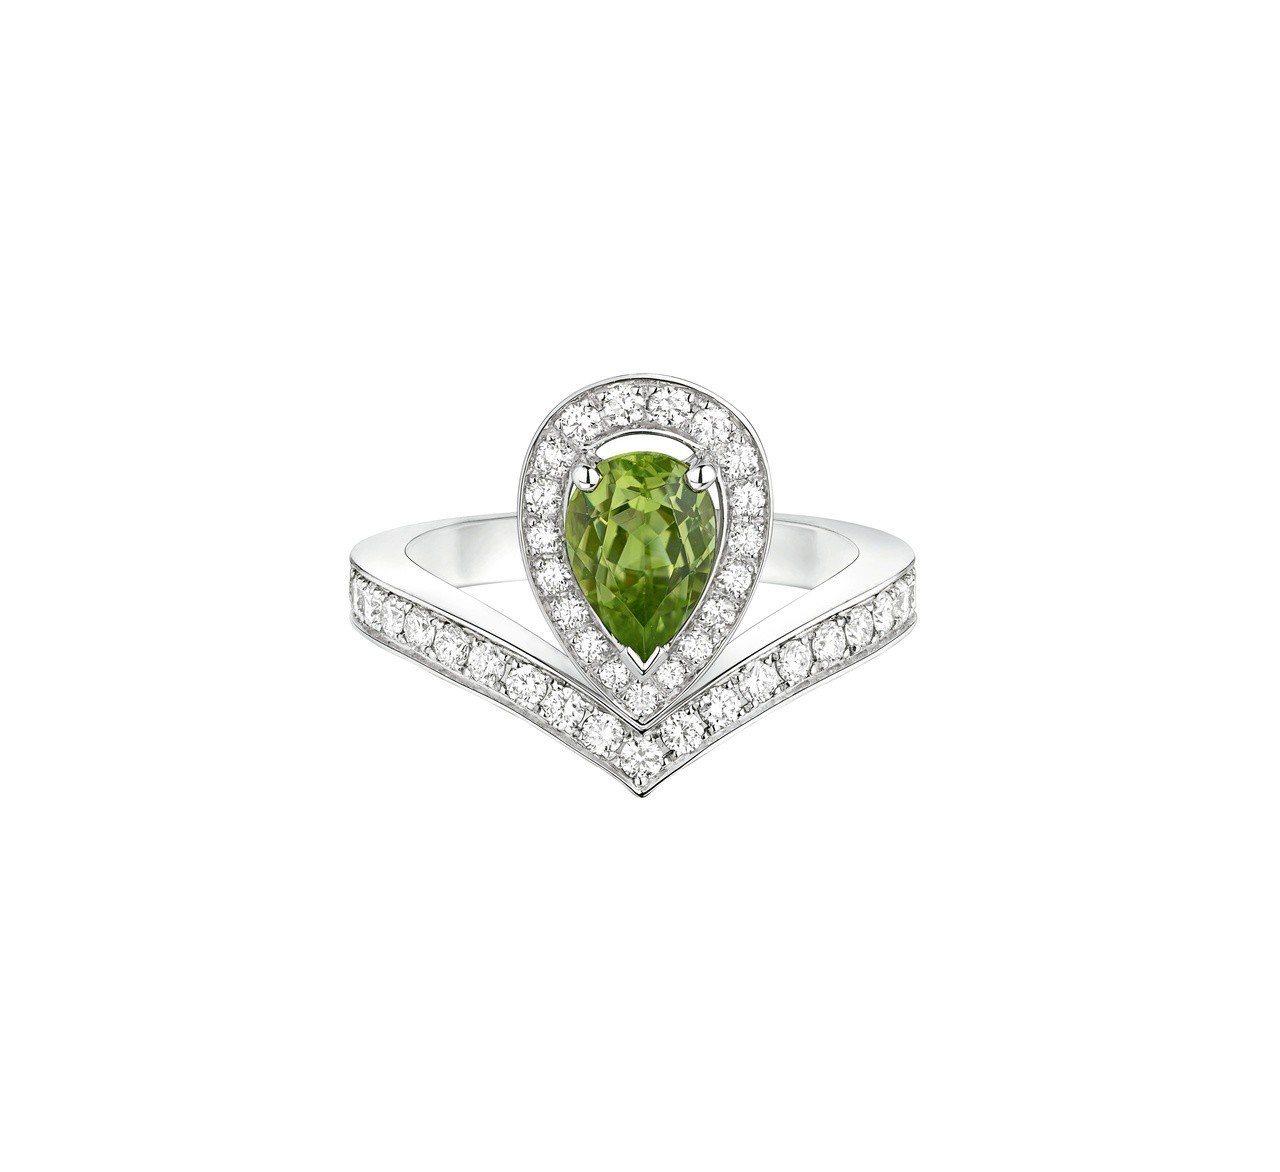 Chaumet Joséphine Aigrette 18K白金橄欖石戒指,2...